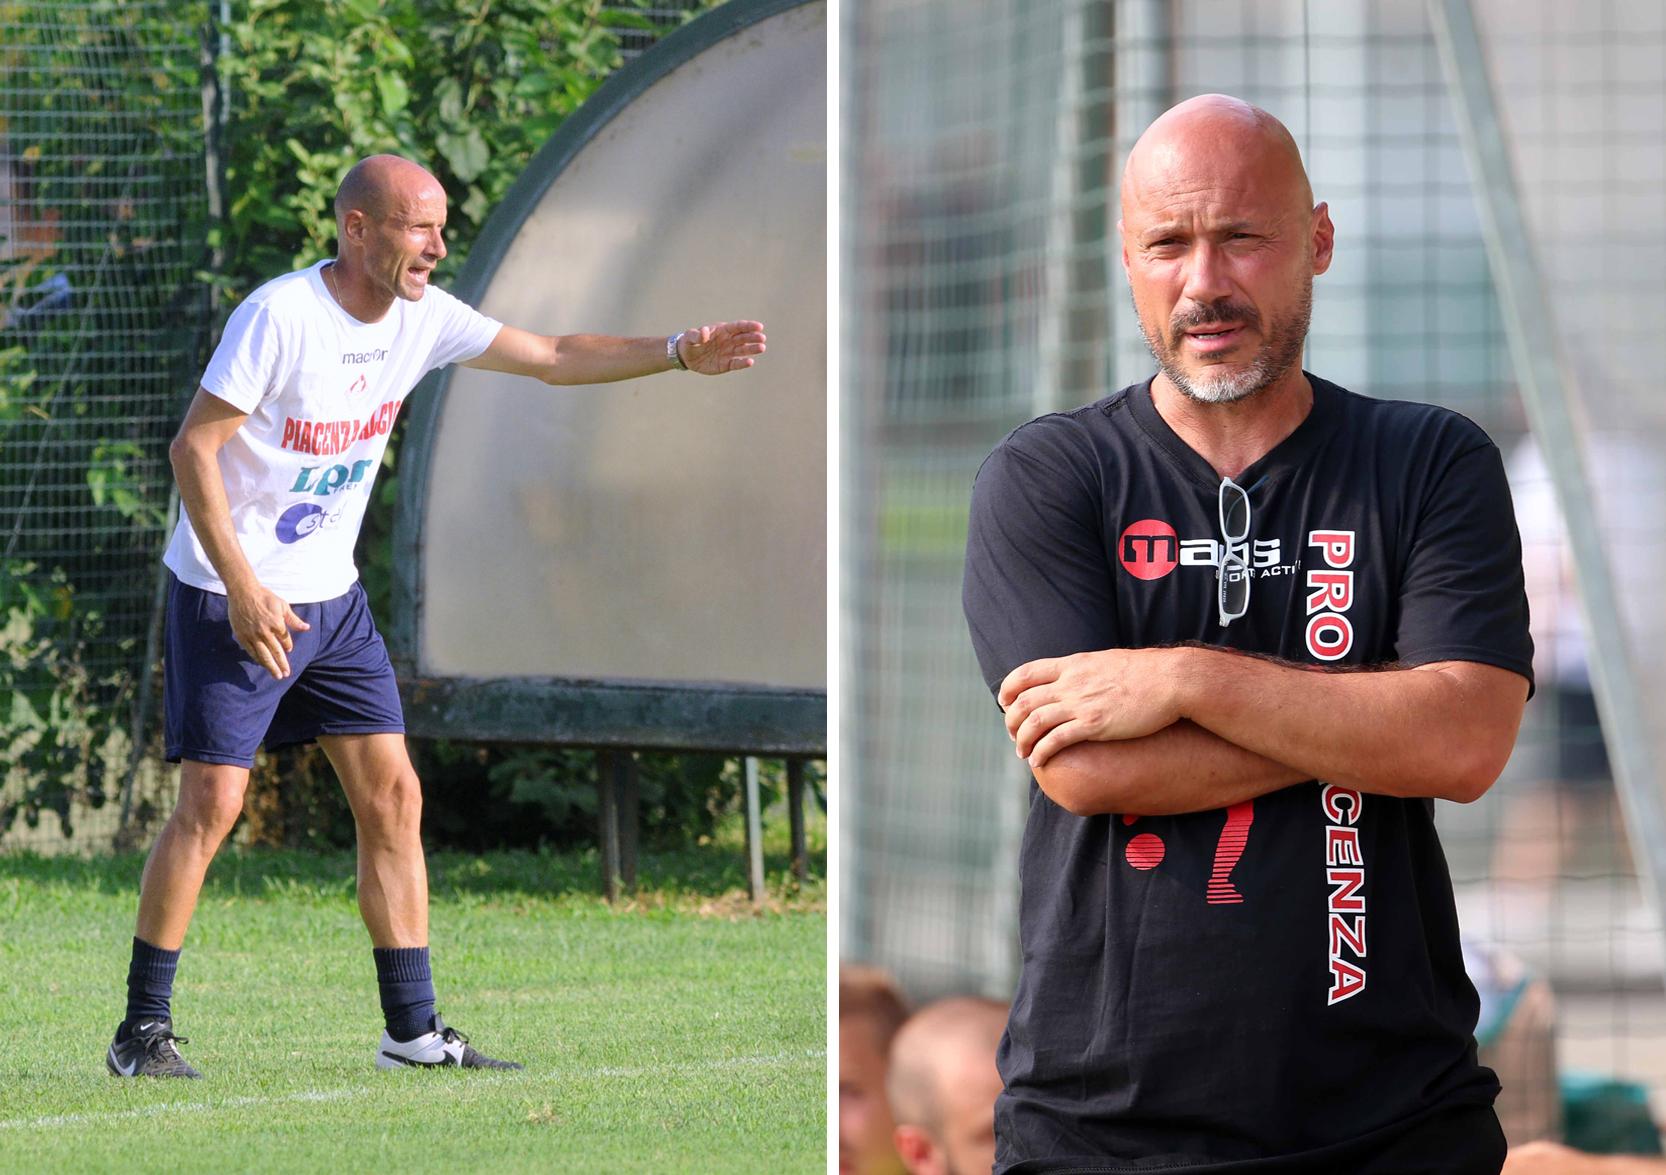 Piacenza Calcio Entella per Capra (FotoDELPAPA) Franzini